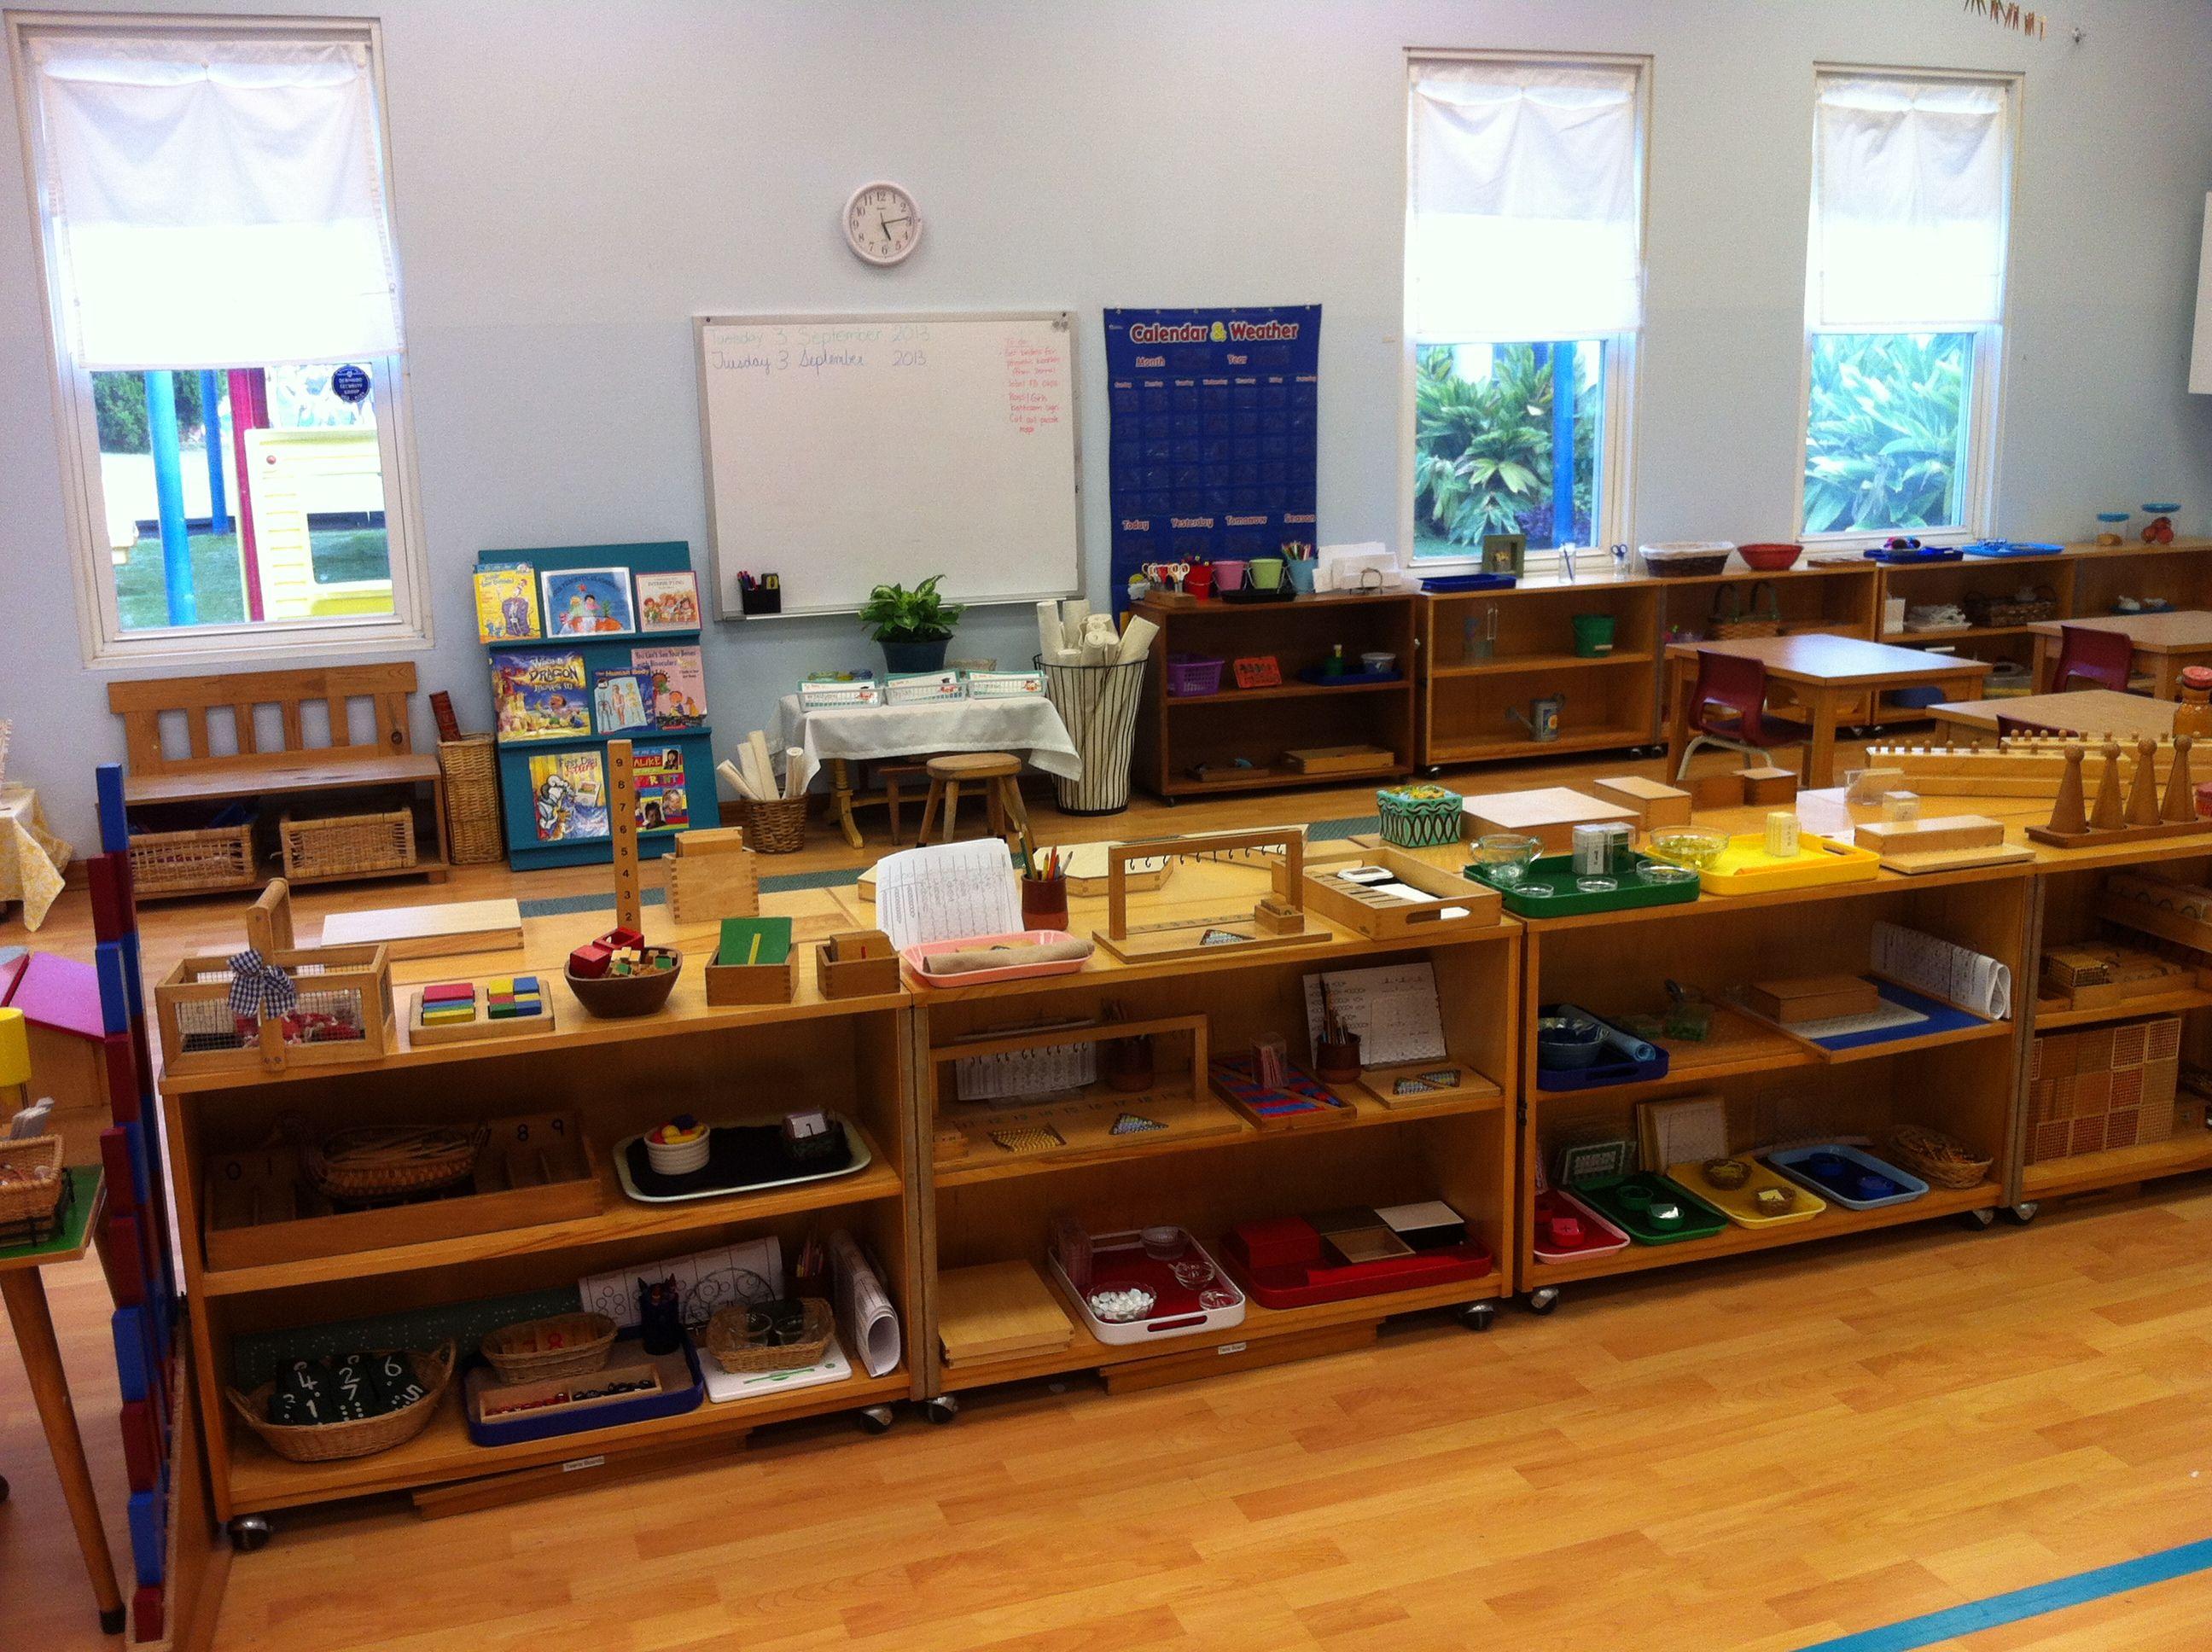 Classroom Design Overview ~ My montessori classroom math shelves overview